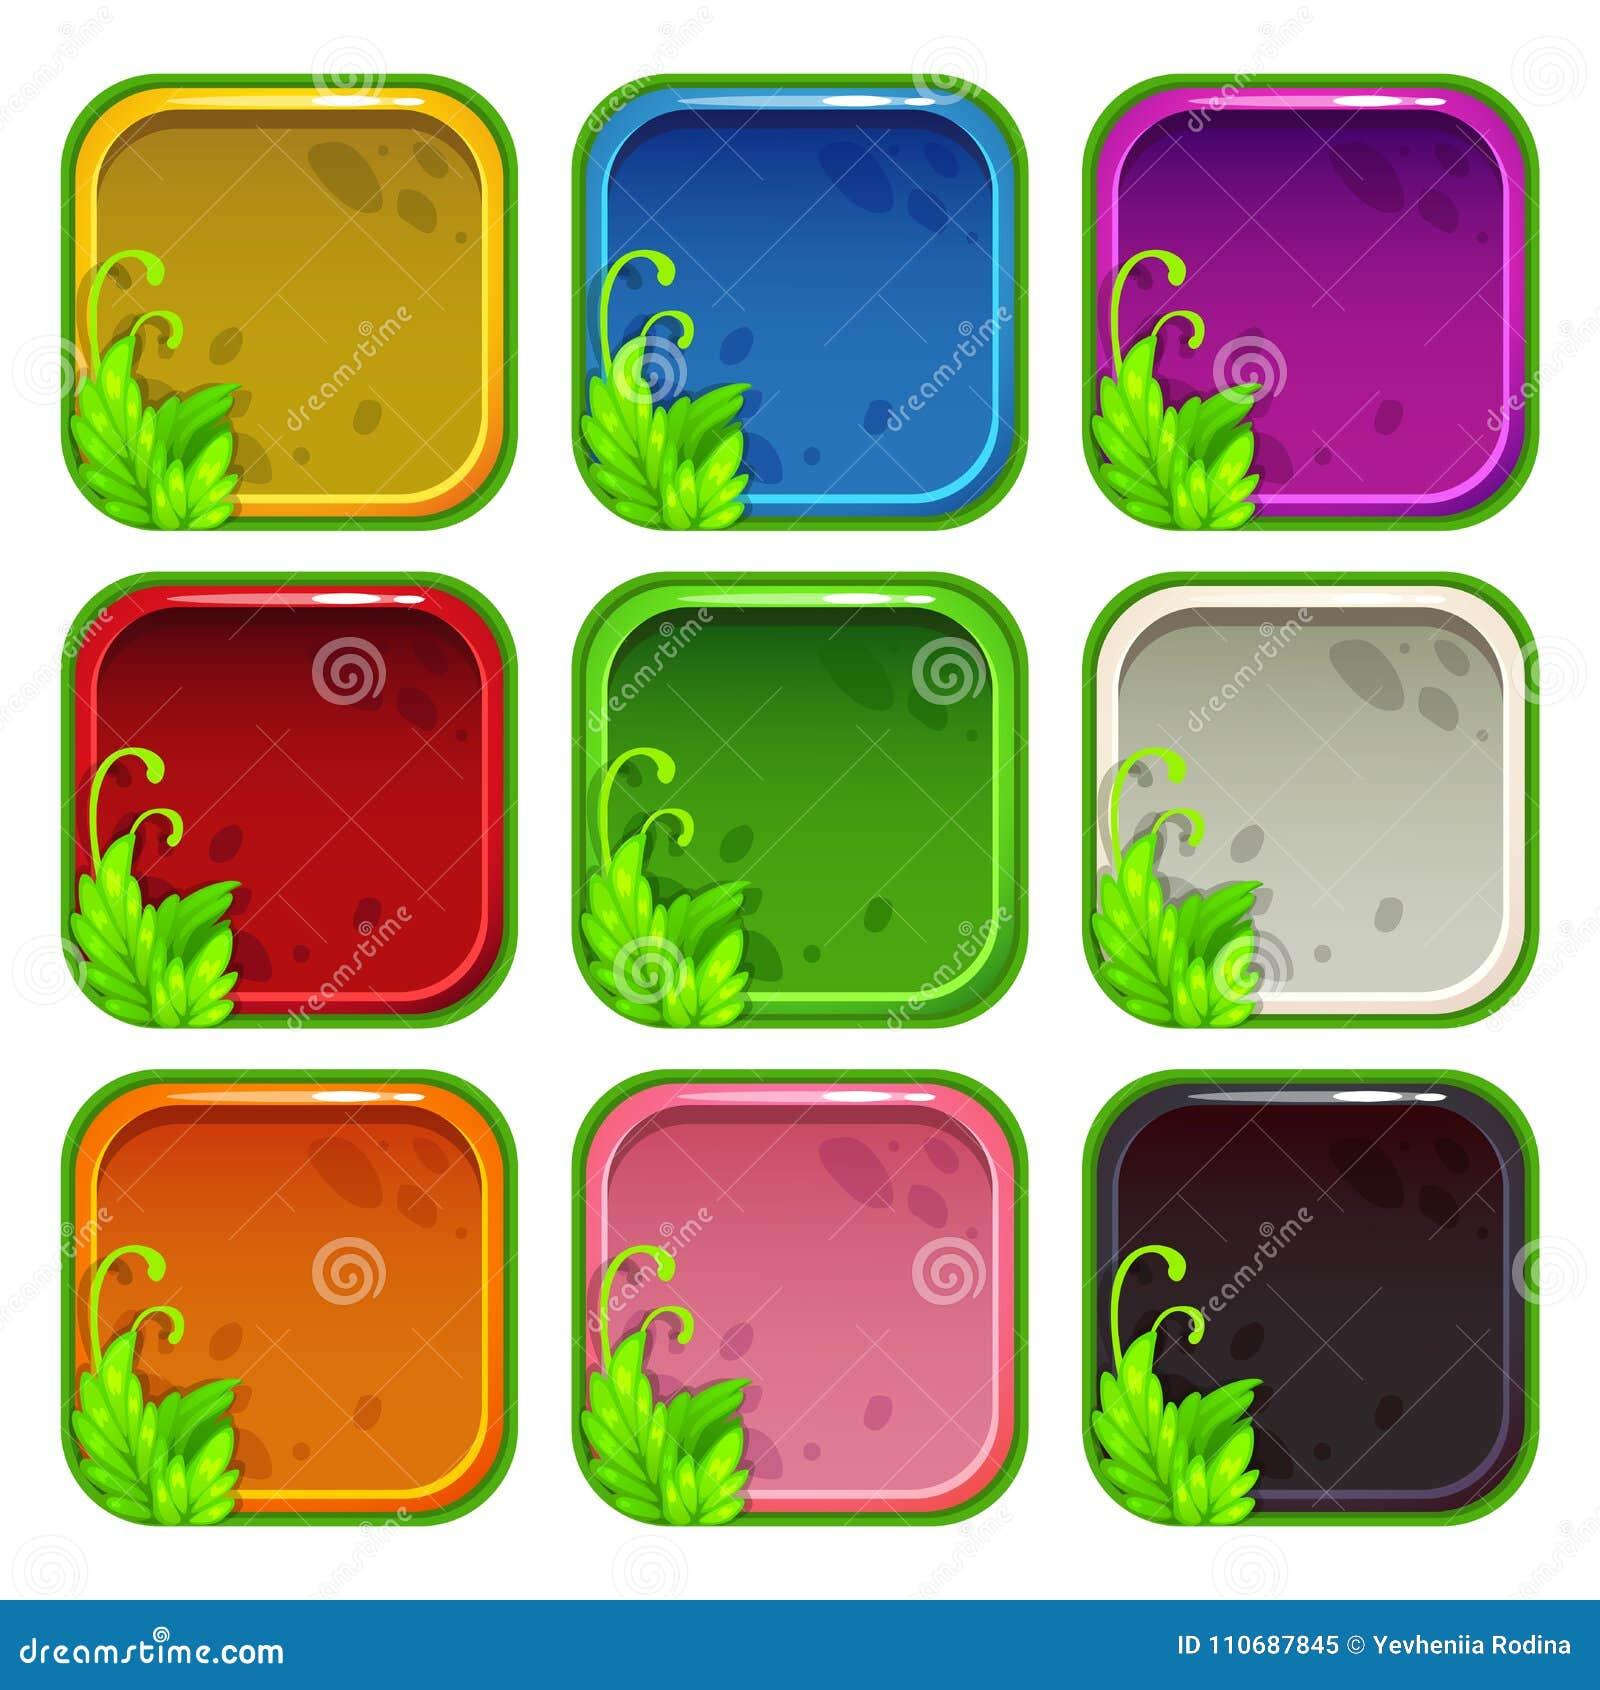 Cartoon Colorful App Icon Frames Set Stock Vector - Illustration of ...